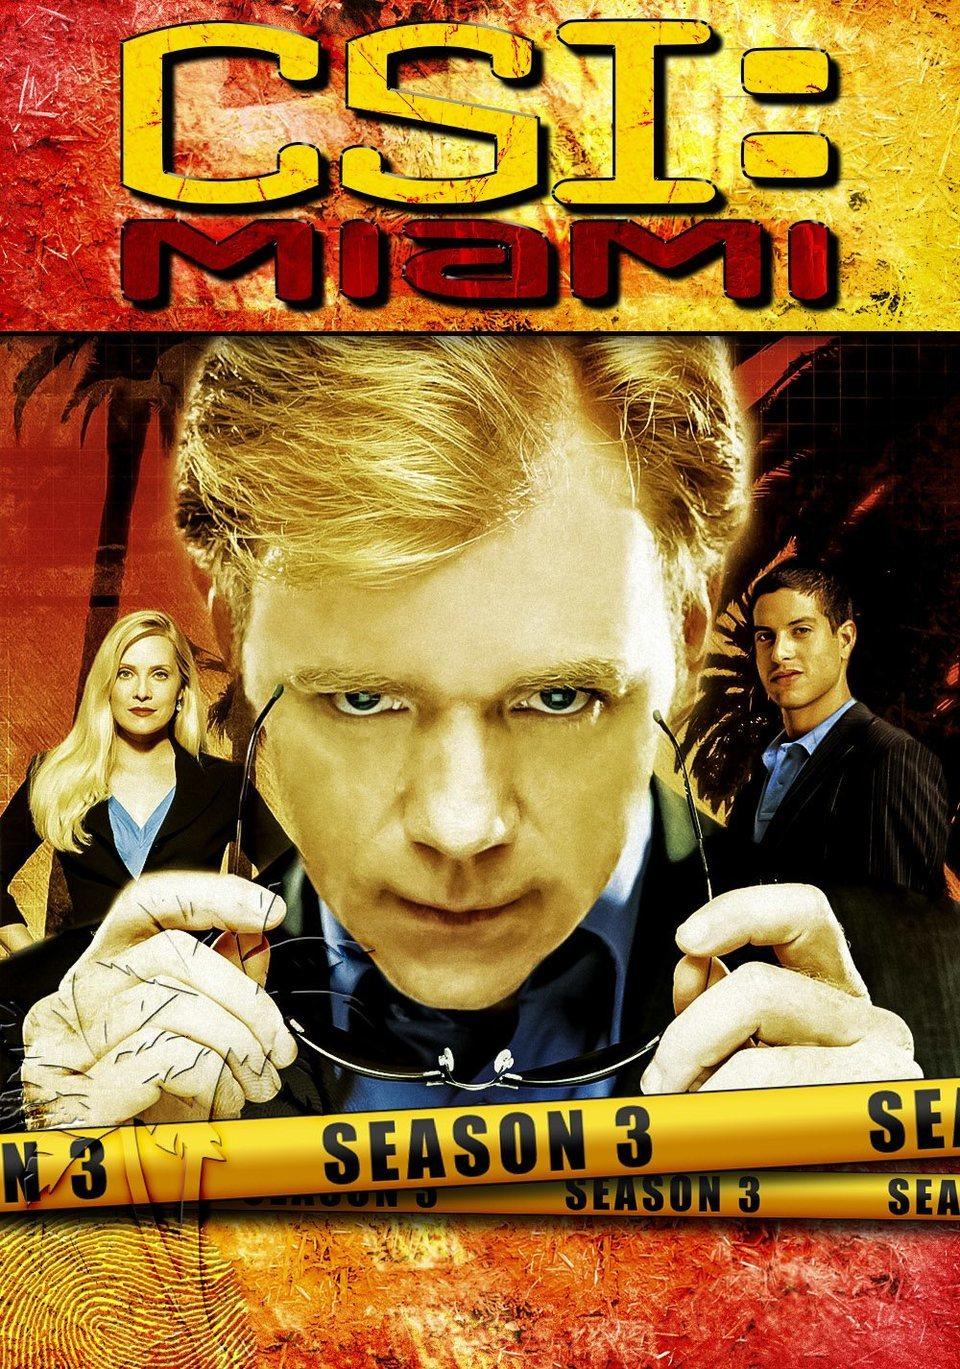 Cartel Temporada 3 de 'CSI: Miami'